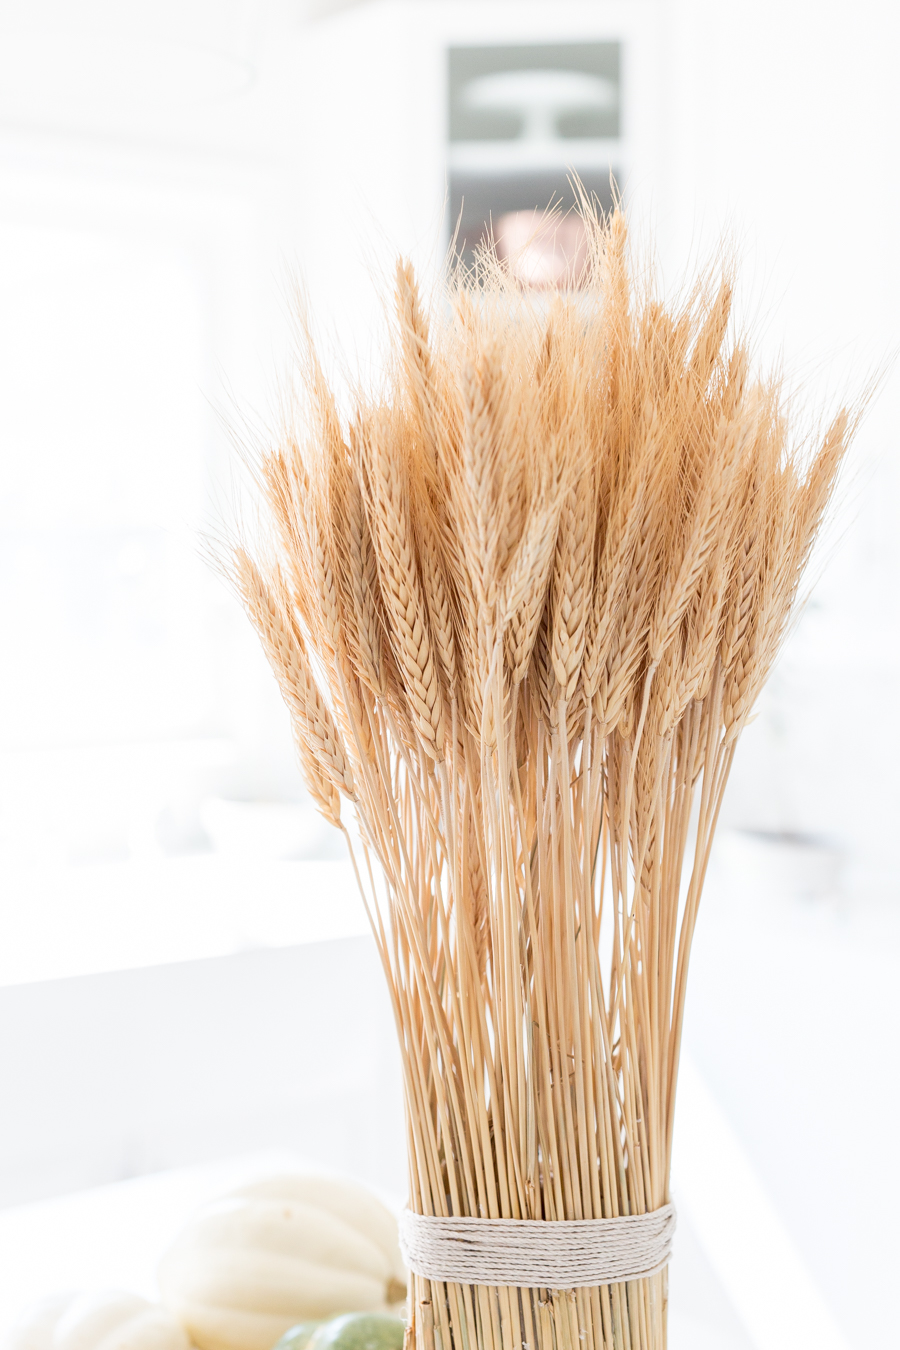 wheatbundlediycraftberrybush-11